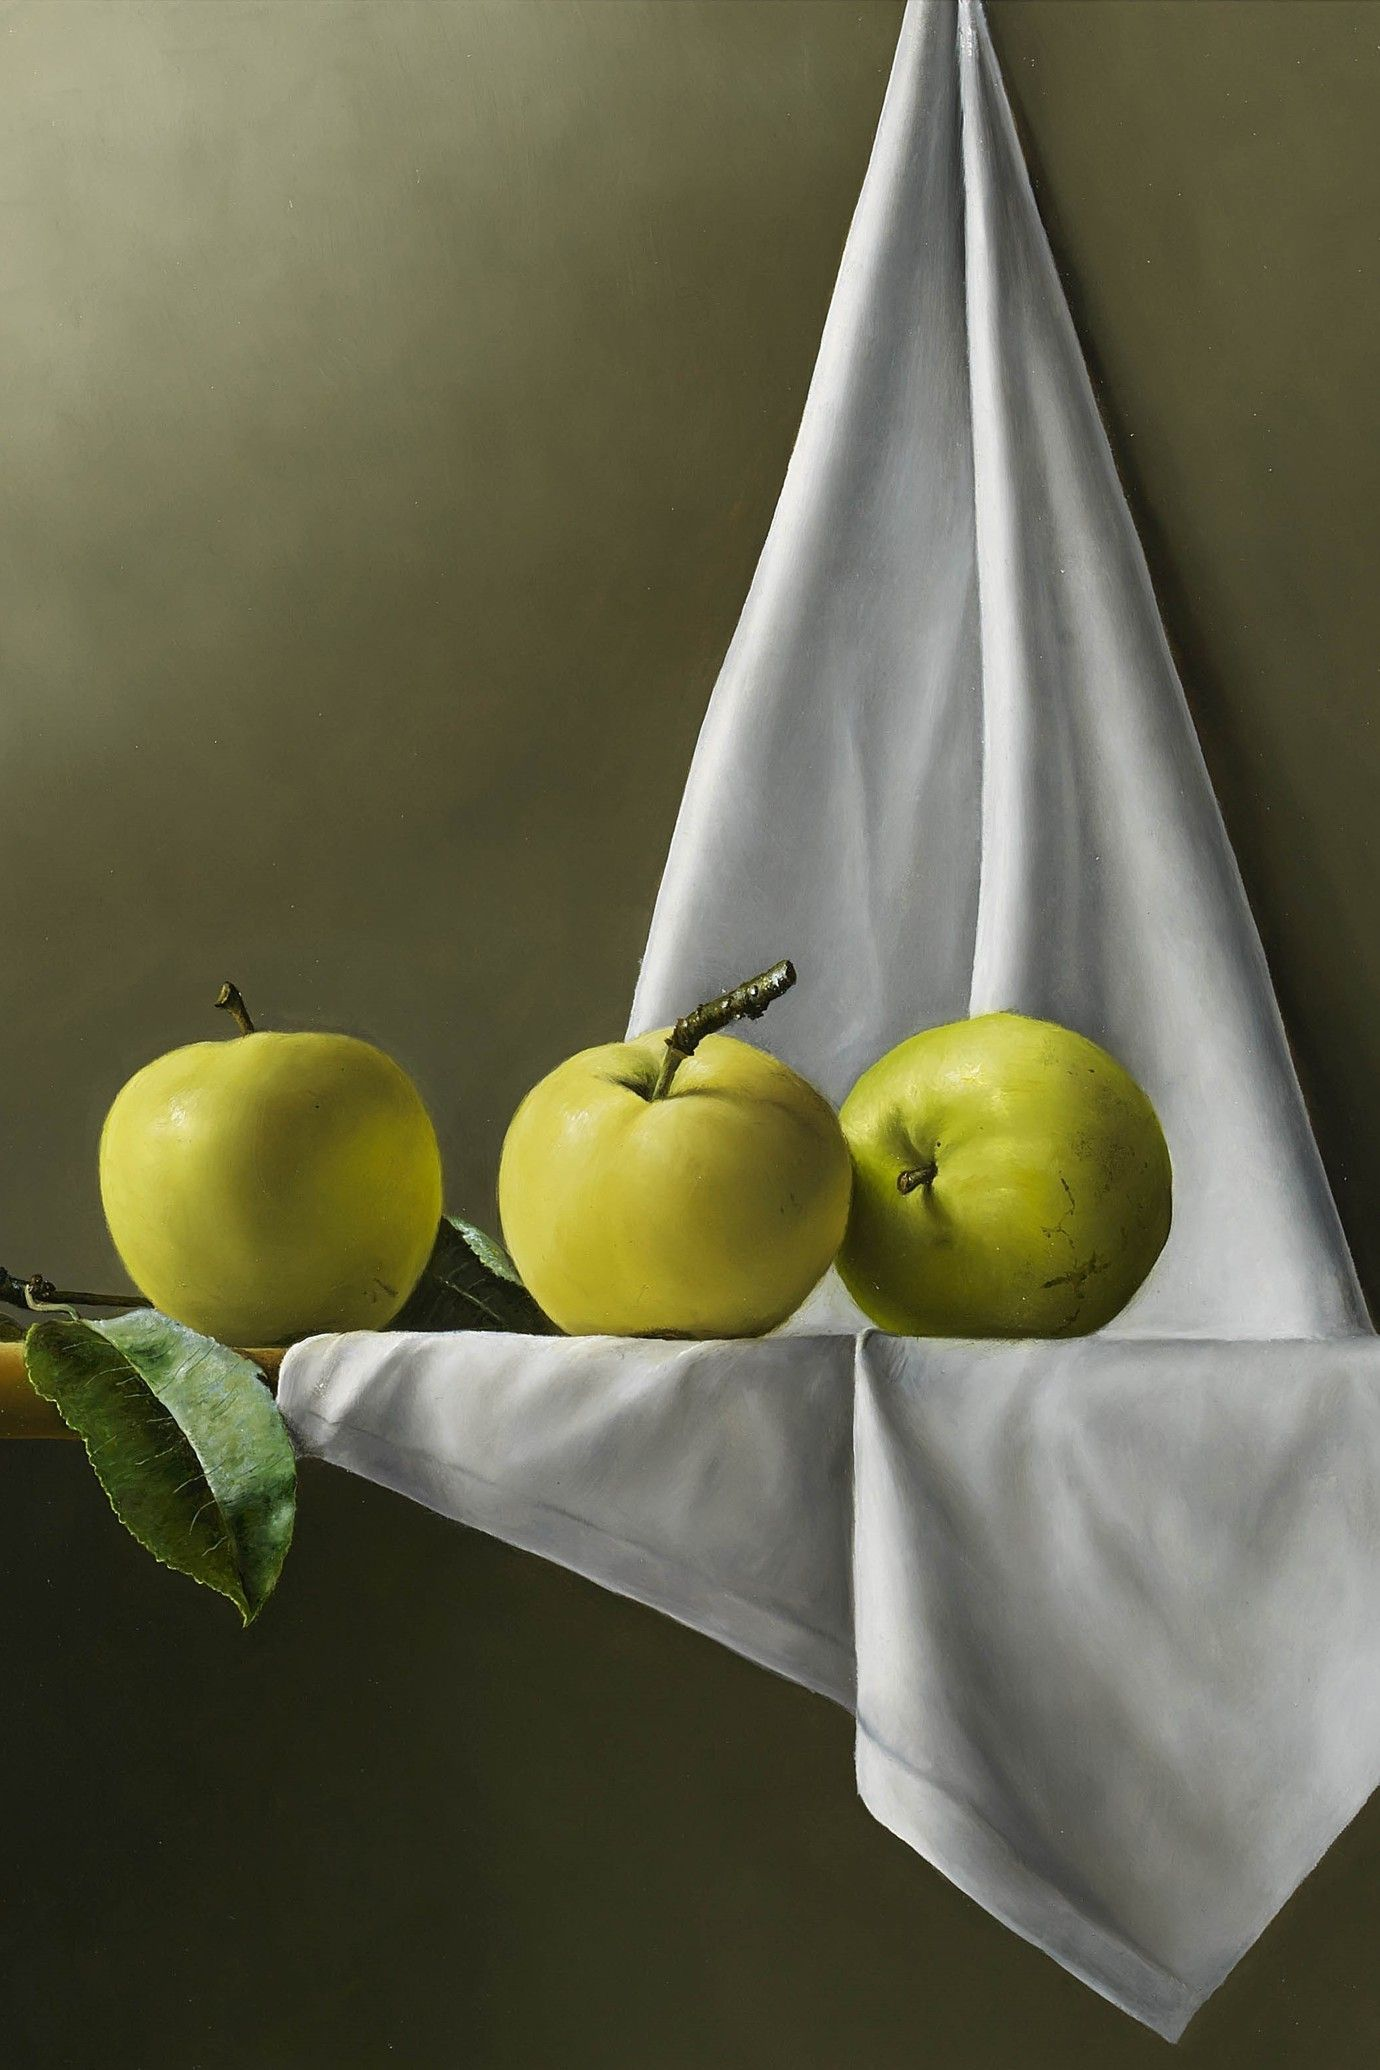 Johan De Fre, 1.Three Apples on the Shelf, oil on panel, 20 x 16 ins (51 x 41 cms)